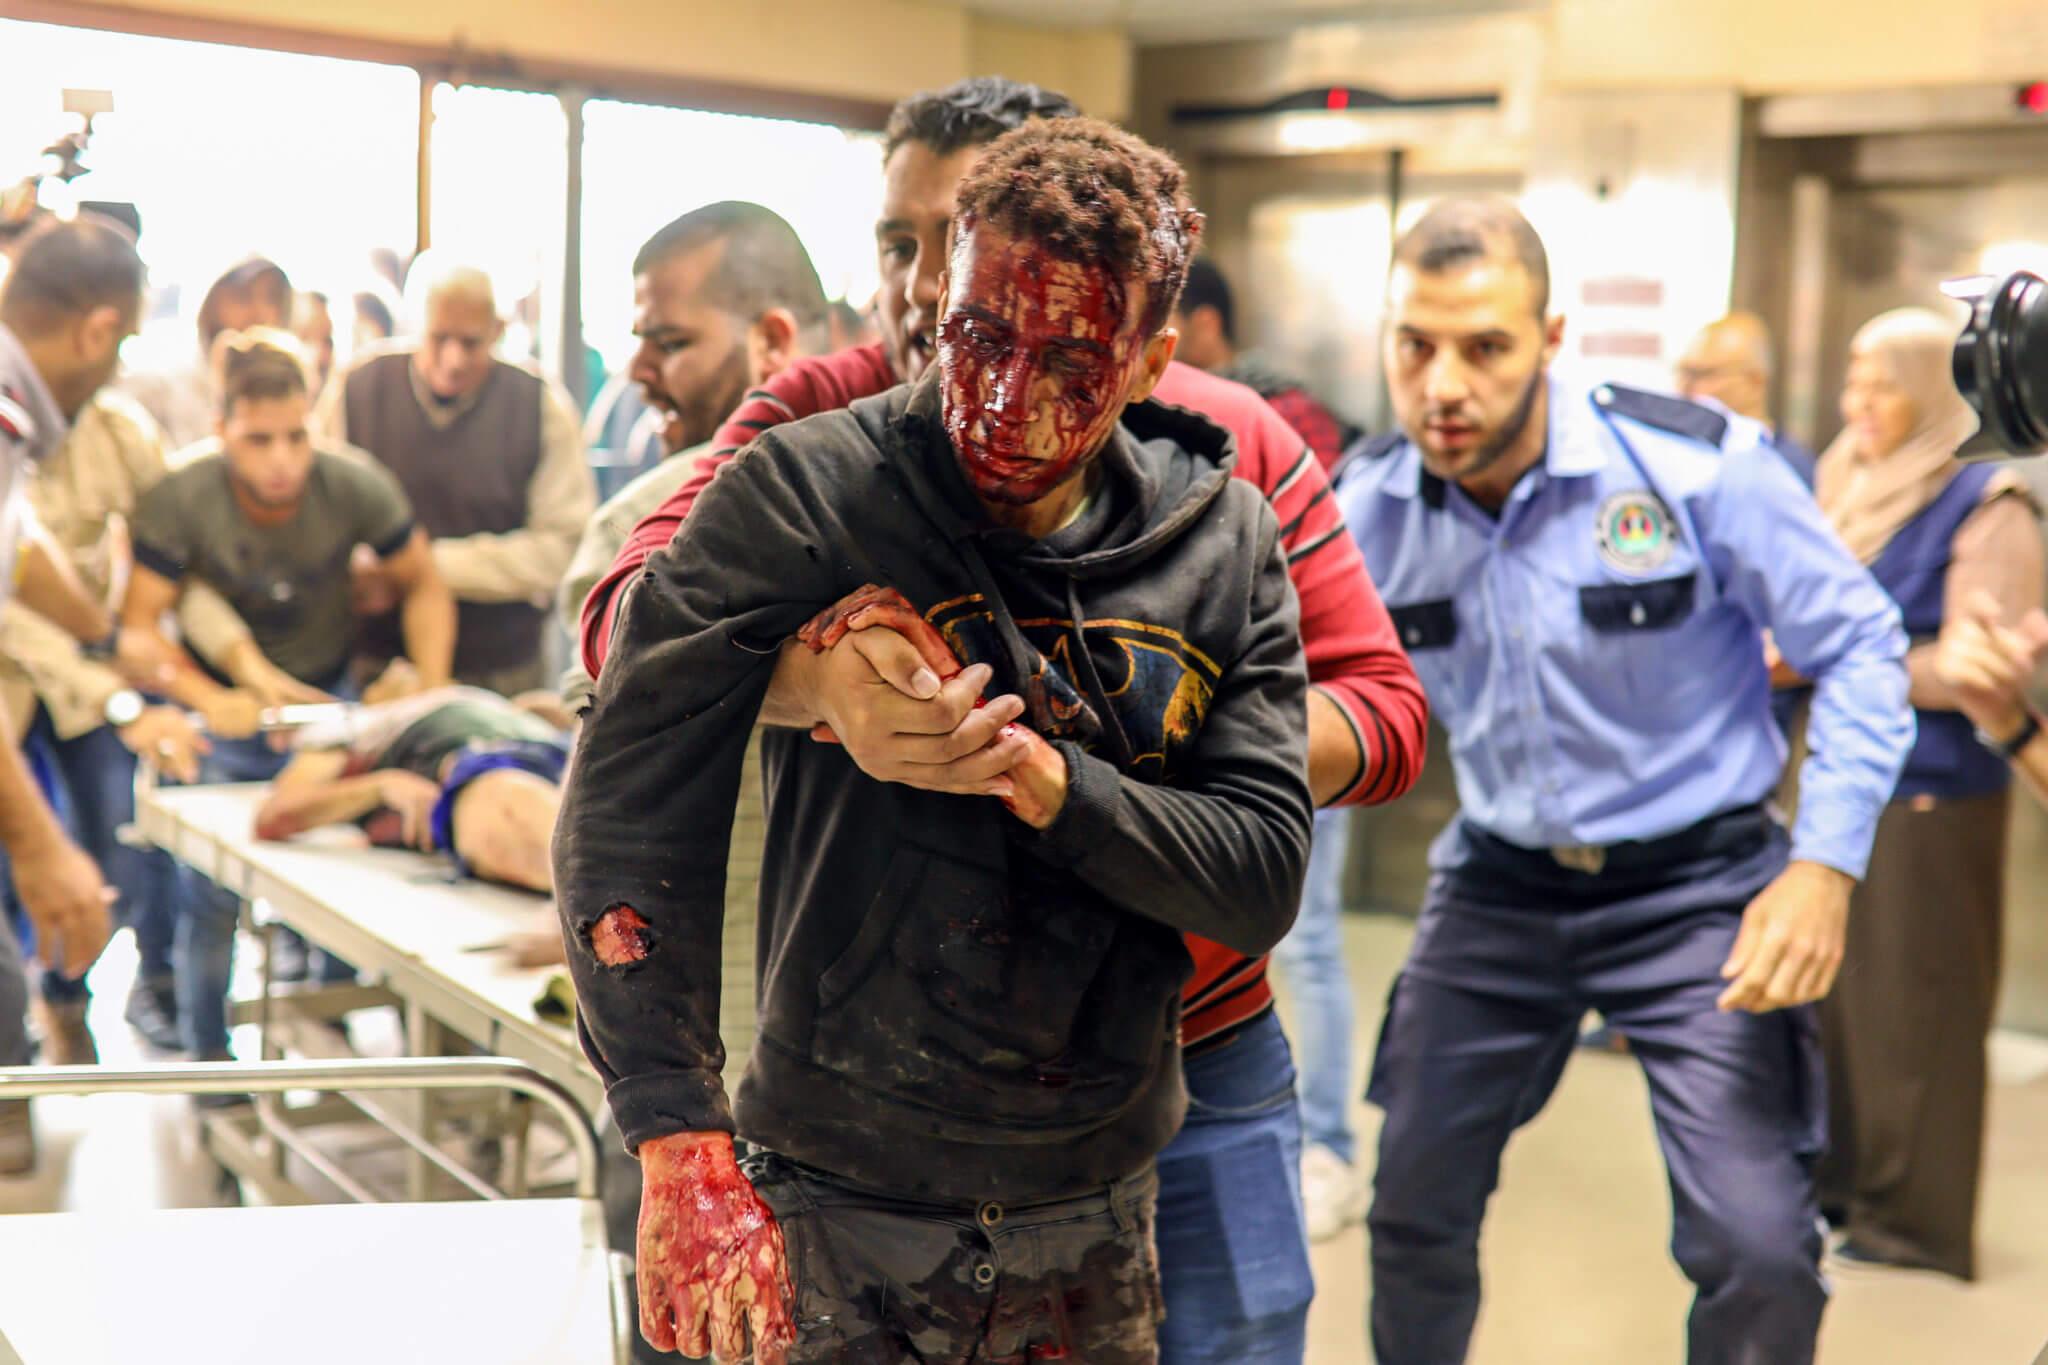 Scenes at Al-Shifa' Hospital (Photo: Mohammed Zaanoun / Activestills.org)